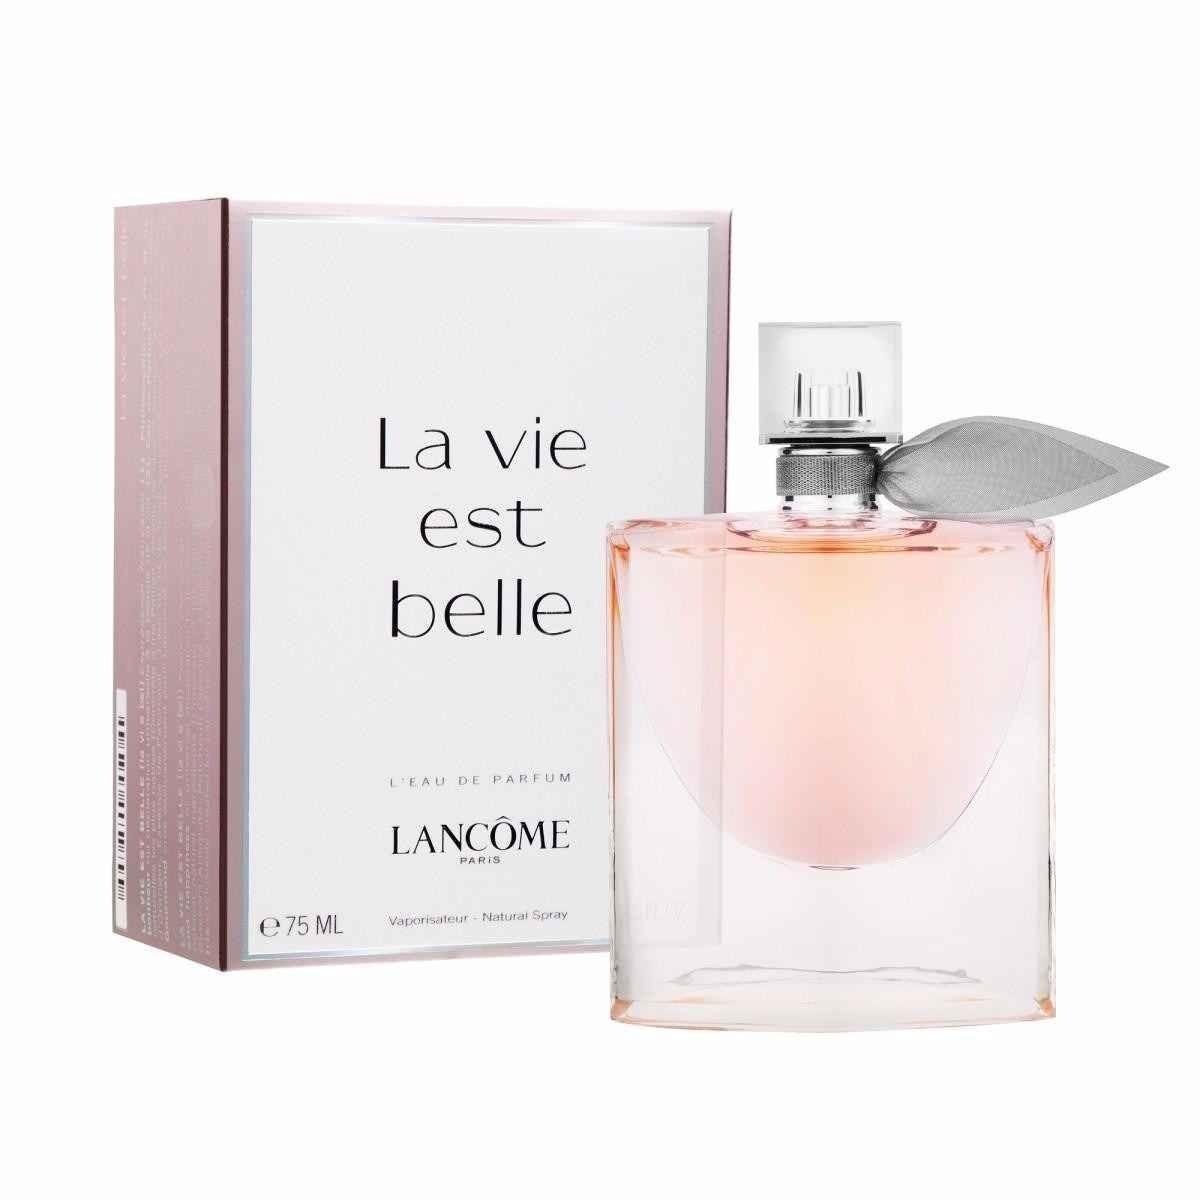 4903872865 LANCOME LA VIE EST BELLE EDP 75 ML FOR WOMEN - Perfume for Bangladesh